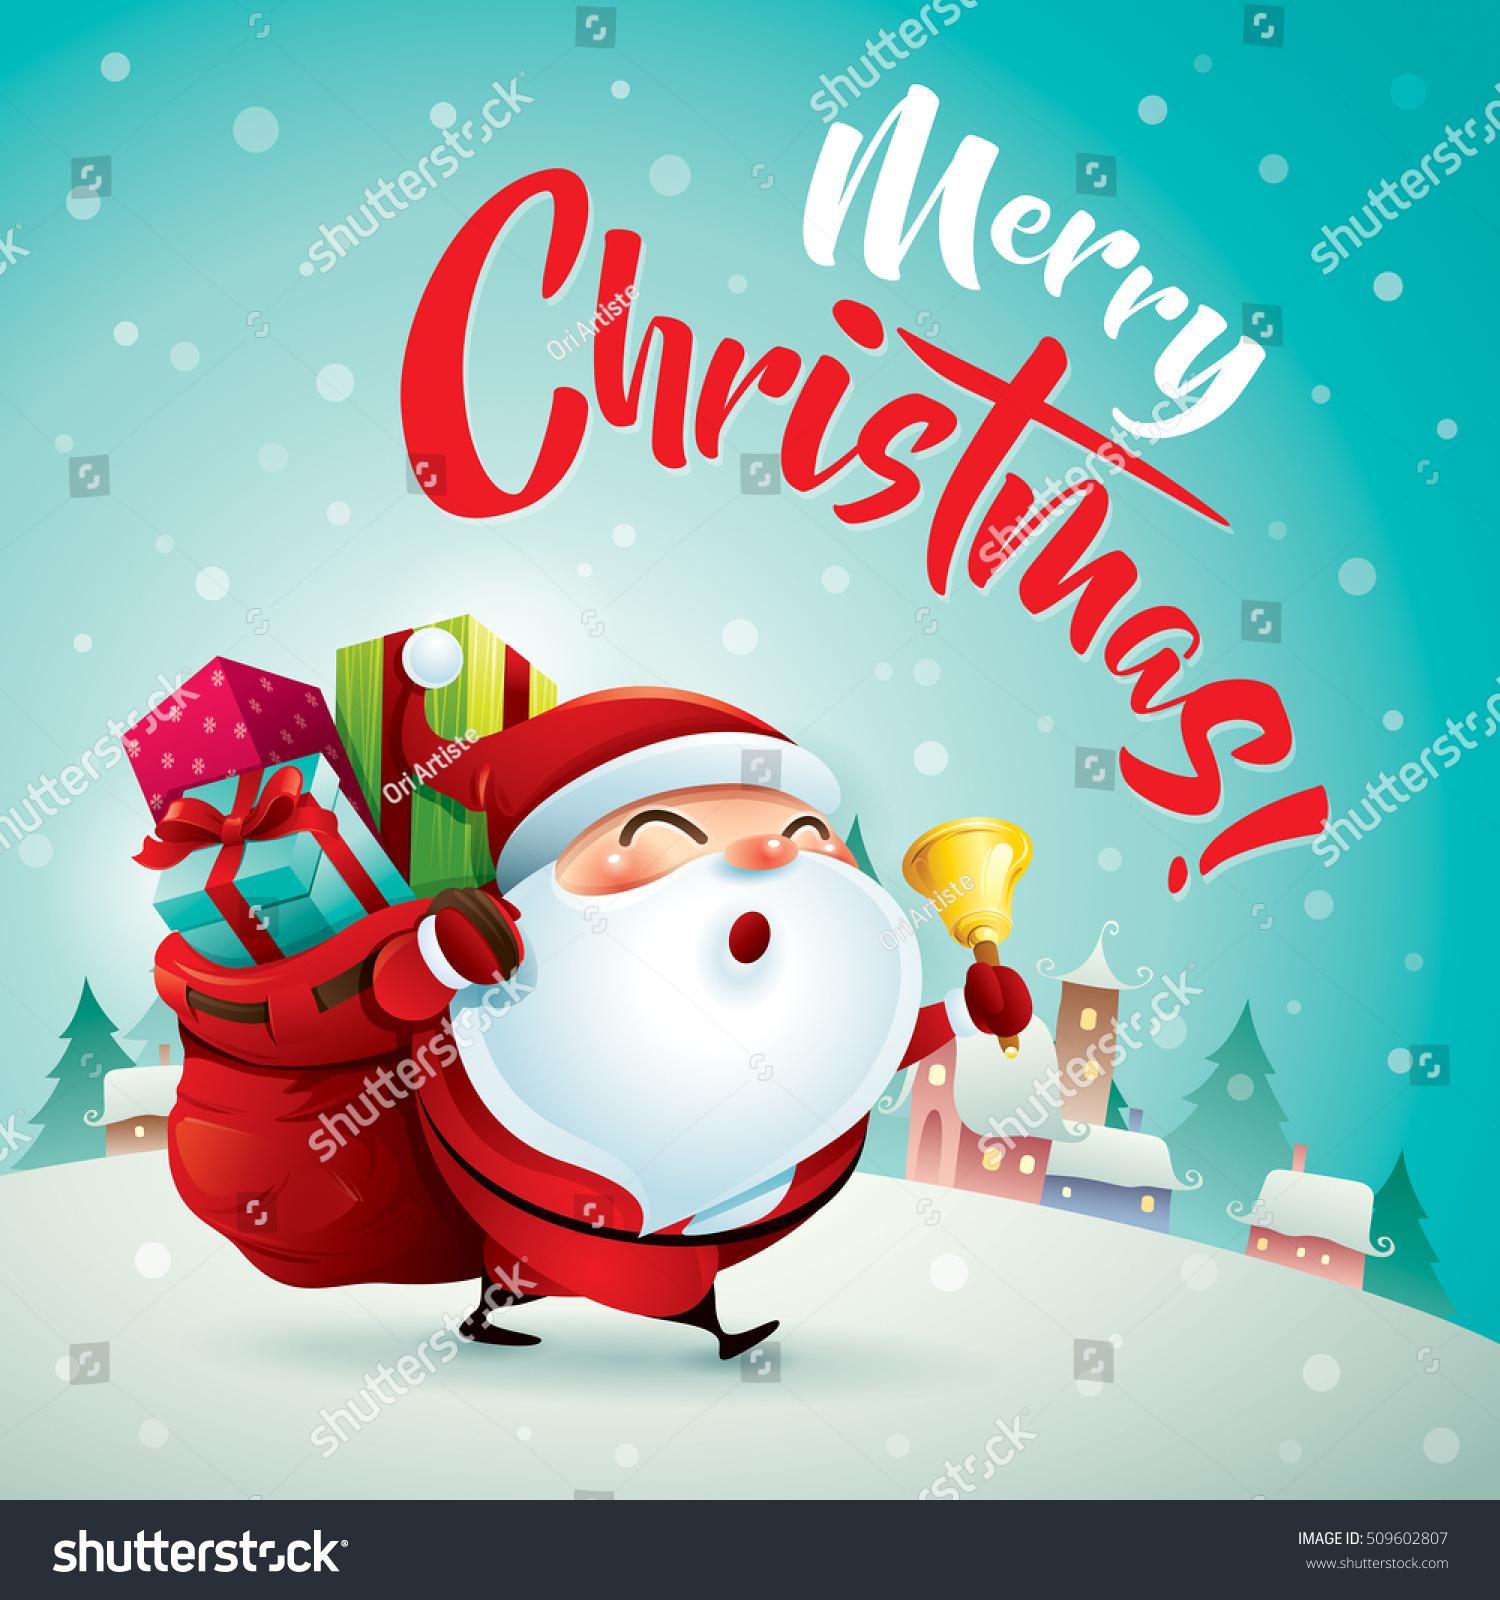 merry christmas santa claus in christmas snow scene christmas greeting card - Santa Claus Christmas